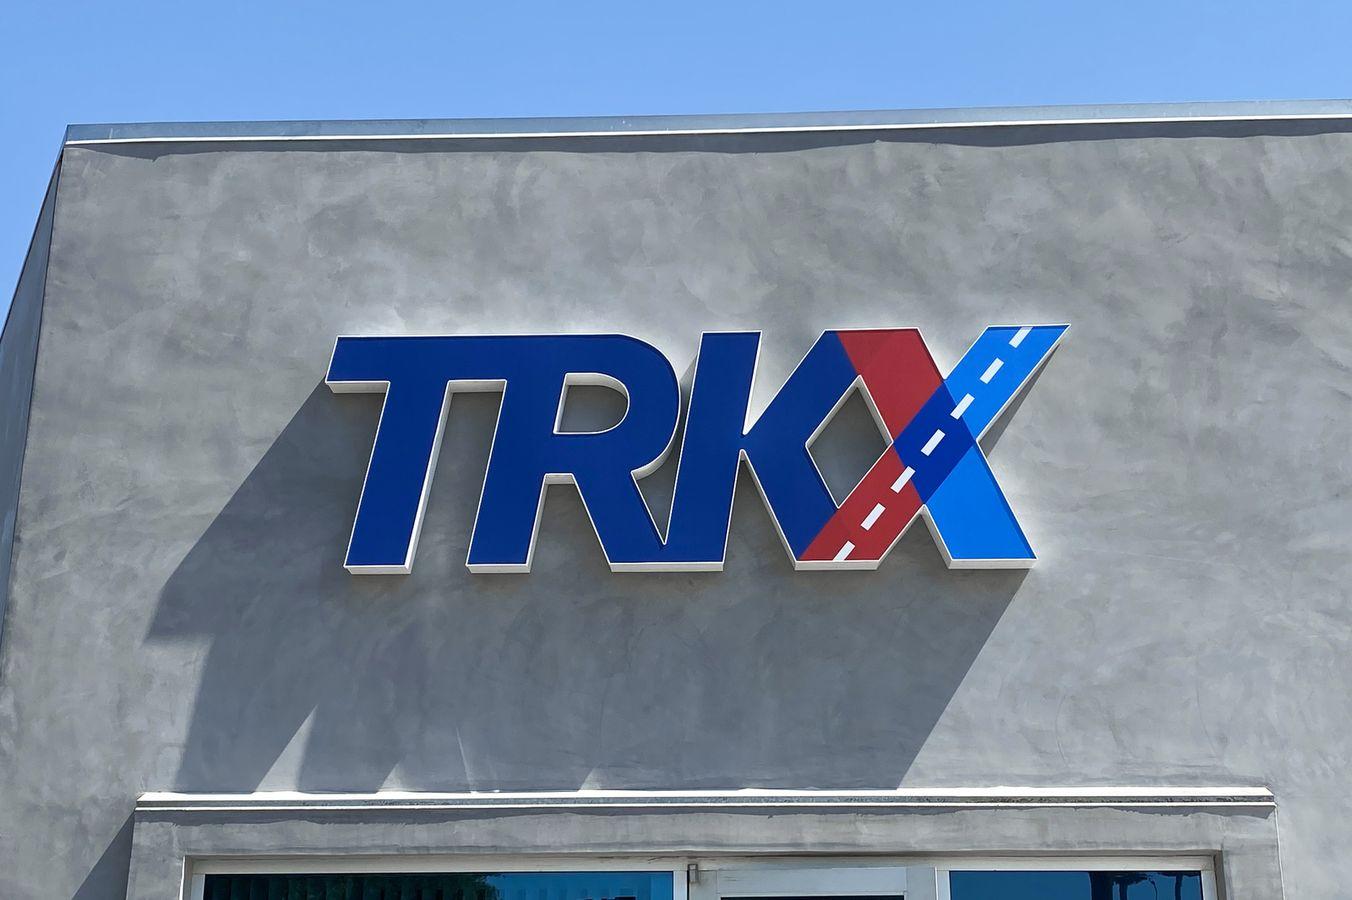 TRKX channel letters